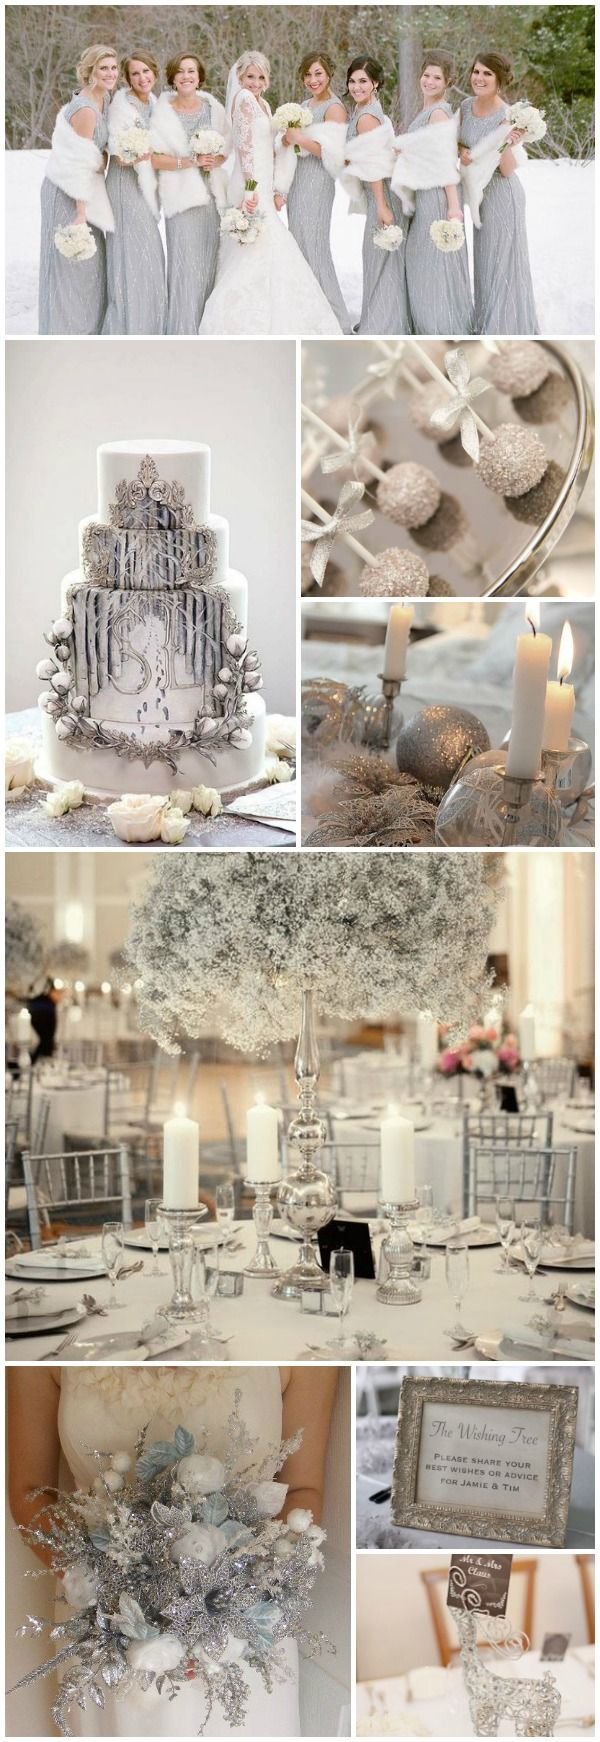 Top 6 Incredible Winter Wonderland Wedding Decorations Ideas